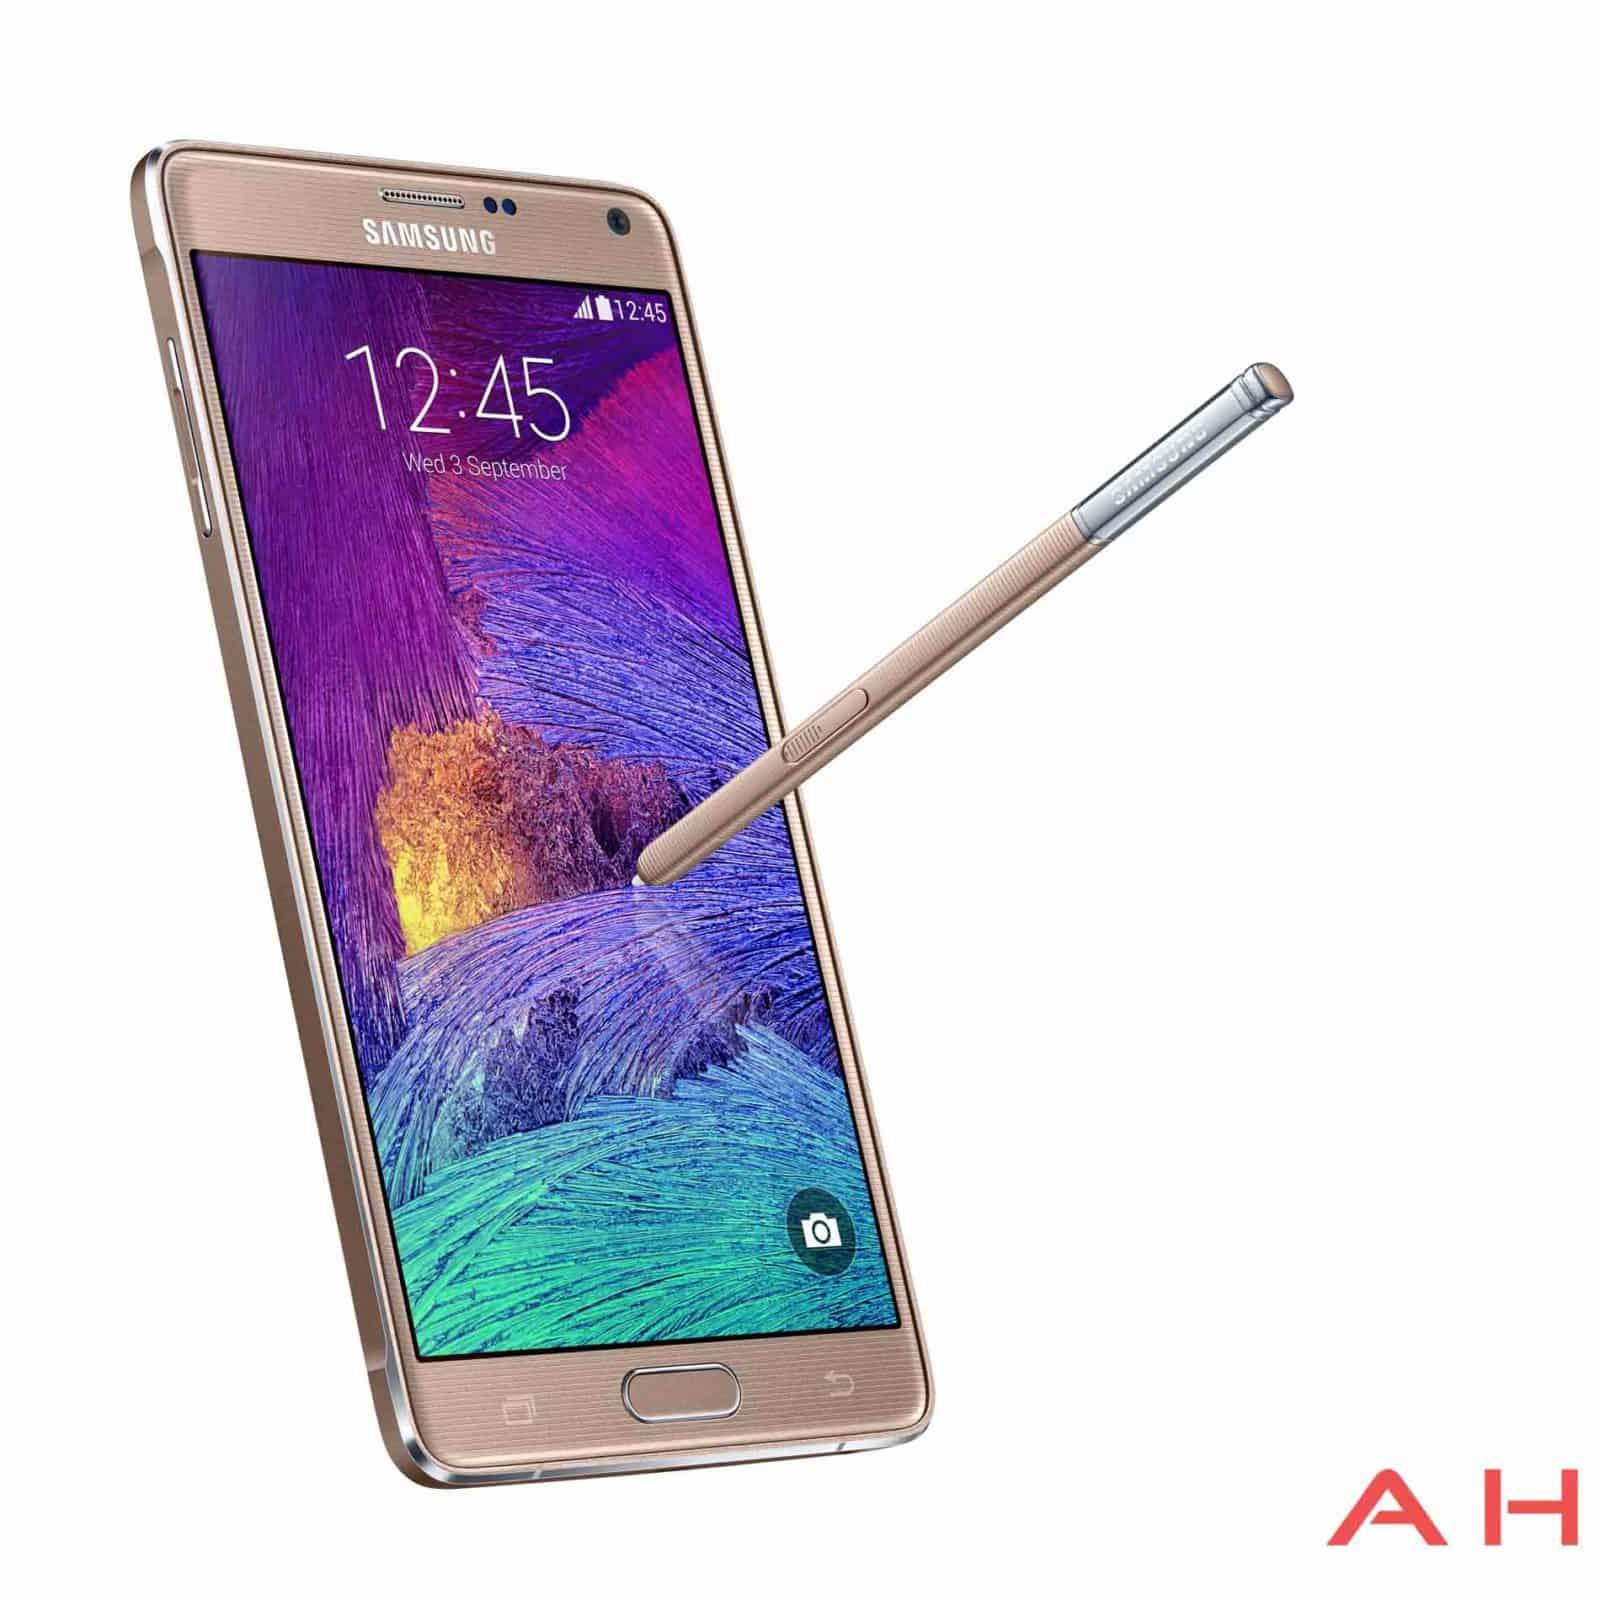 Samsung-Galaxy-Note-4-AH-4